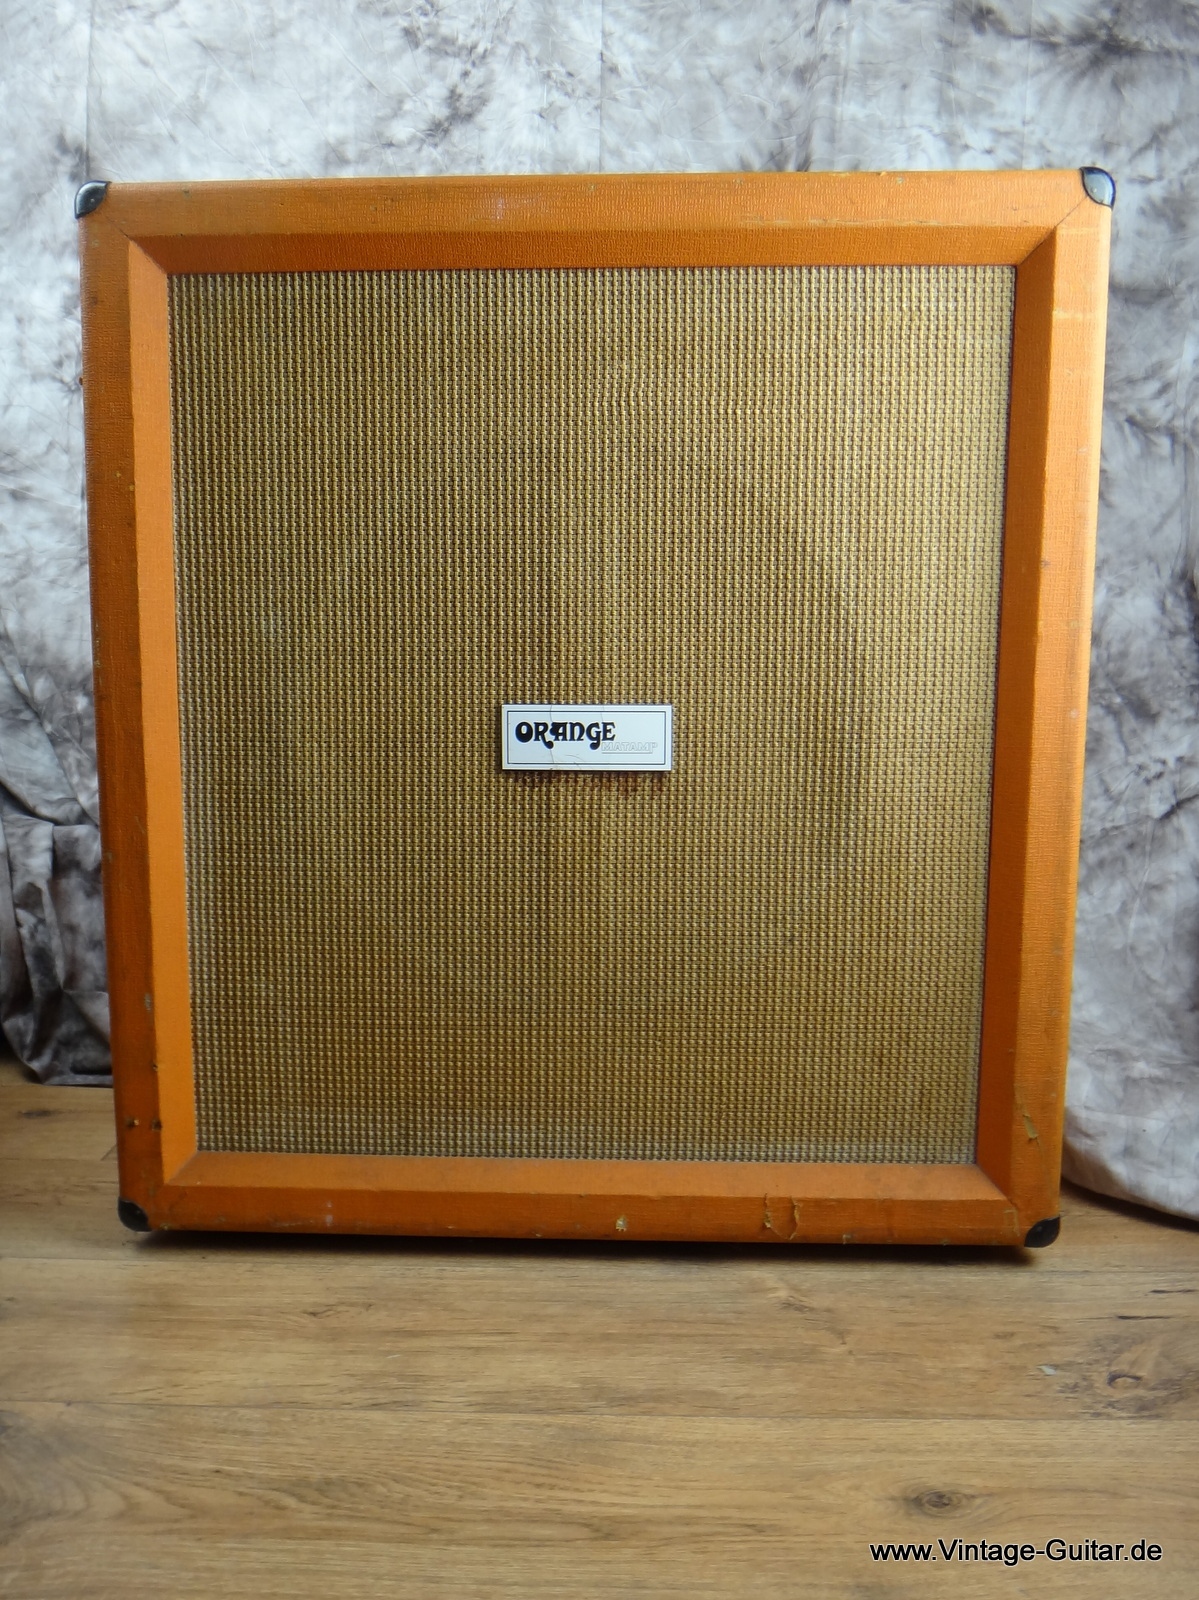 Orange Bass Cabinet 18 Inch 1973 c.   A-1193